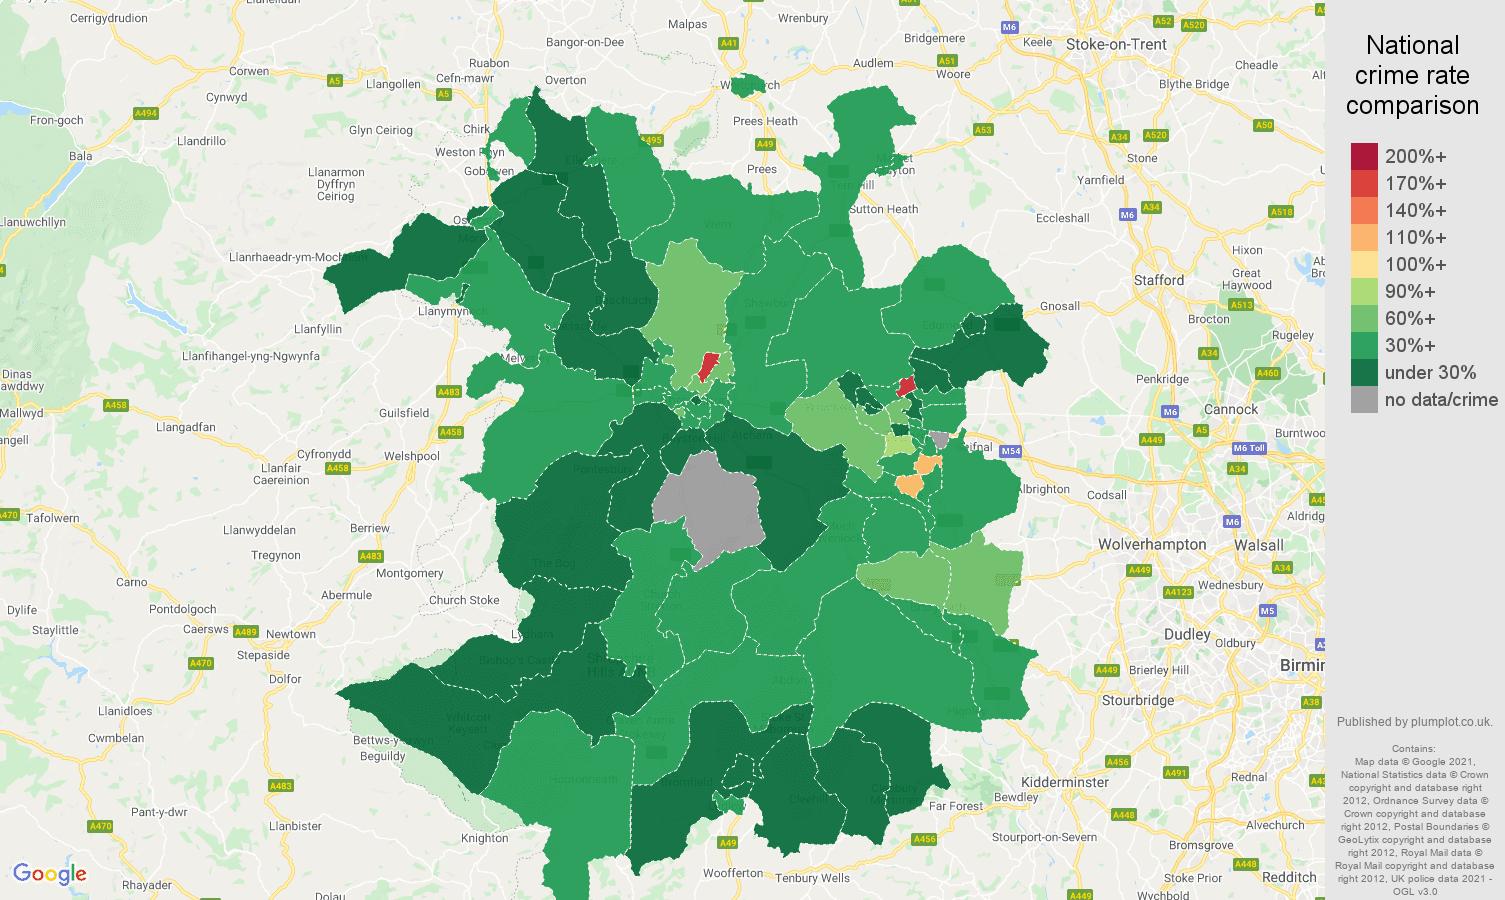 Shropshire vehicle crime rate comparison map